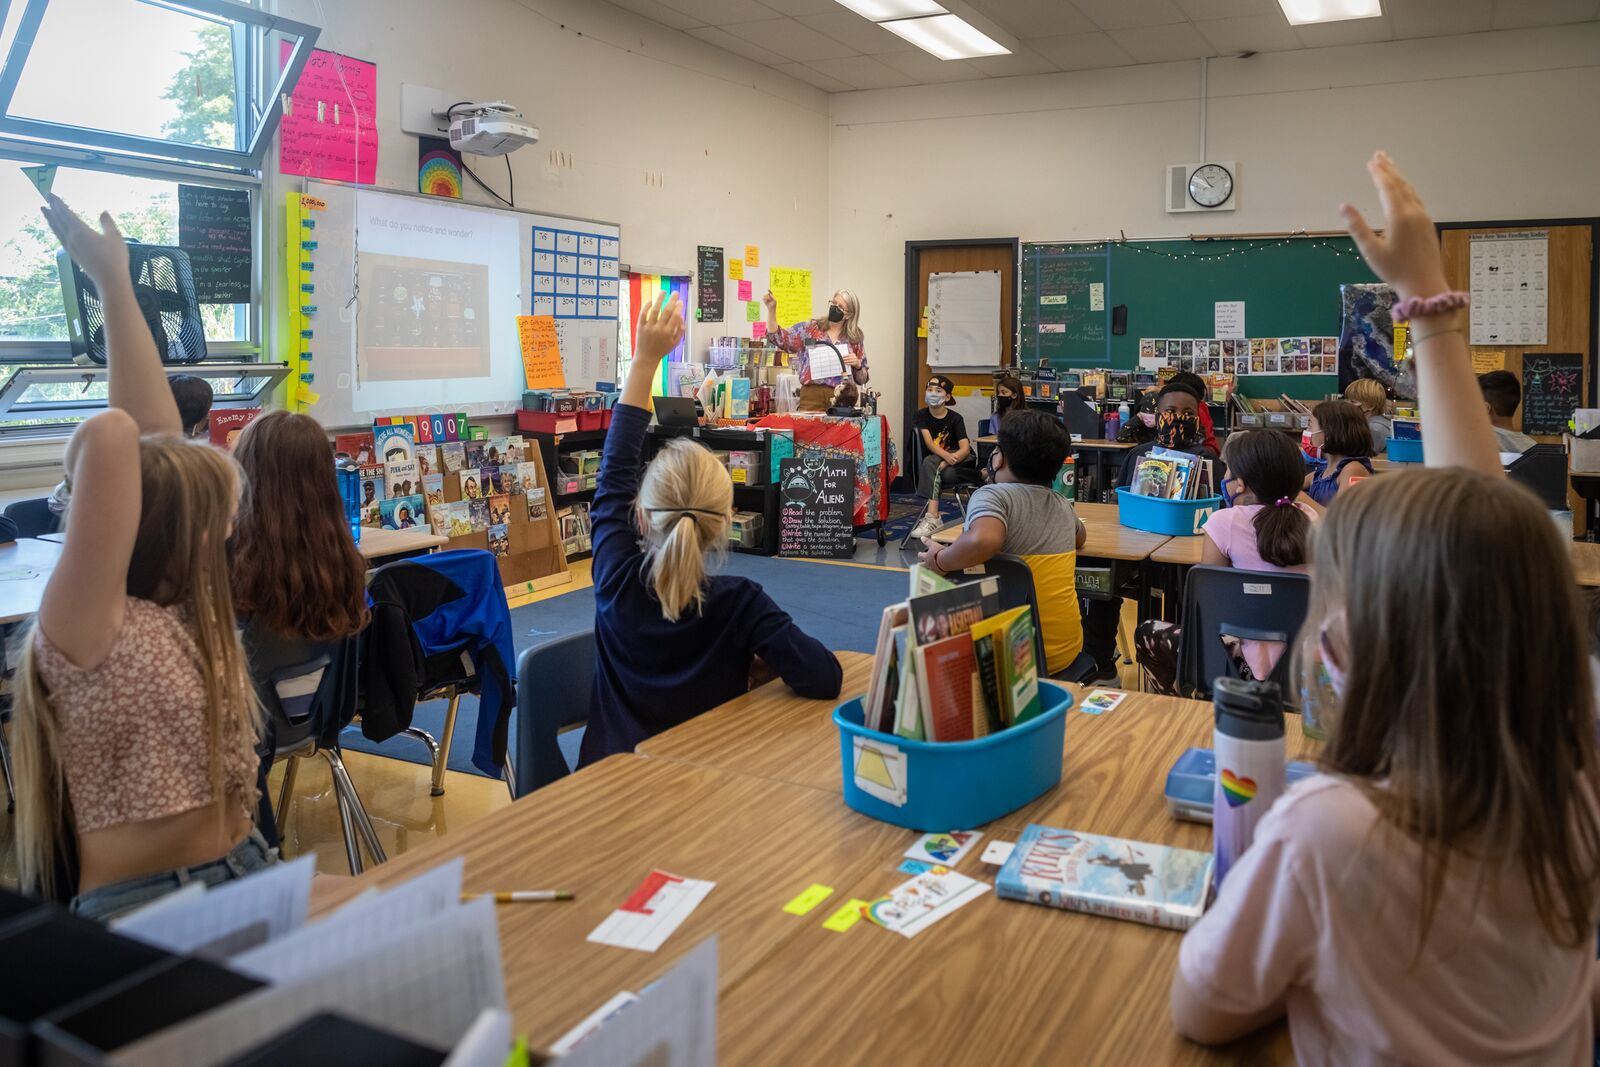 Washington Elementary School 4th grade teacher Dawn Bail instructs class on August 16, 2021. Credit: Kelly Sullivan